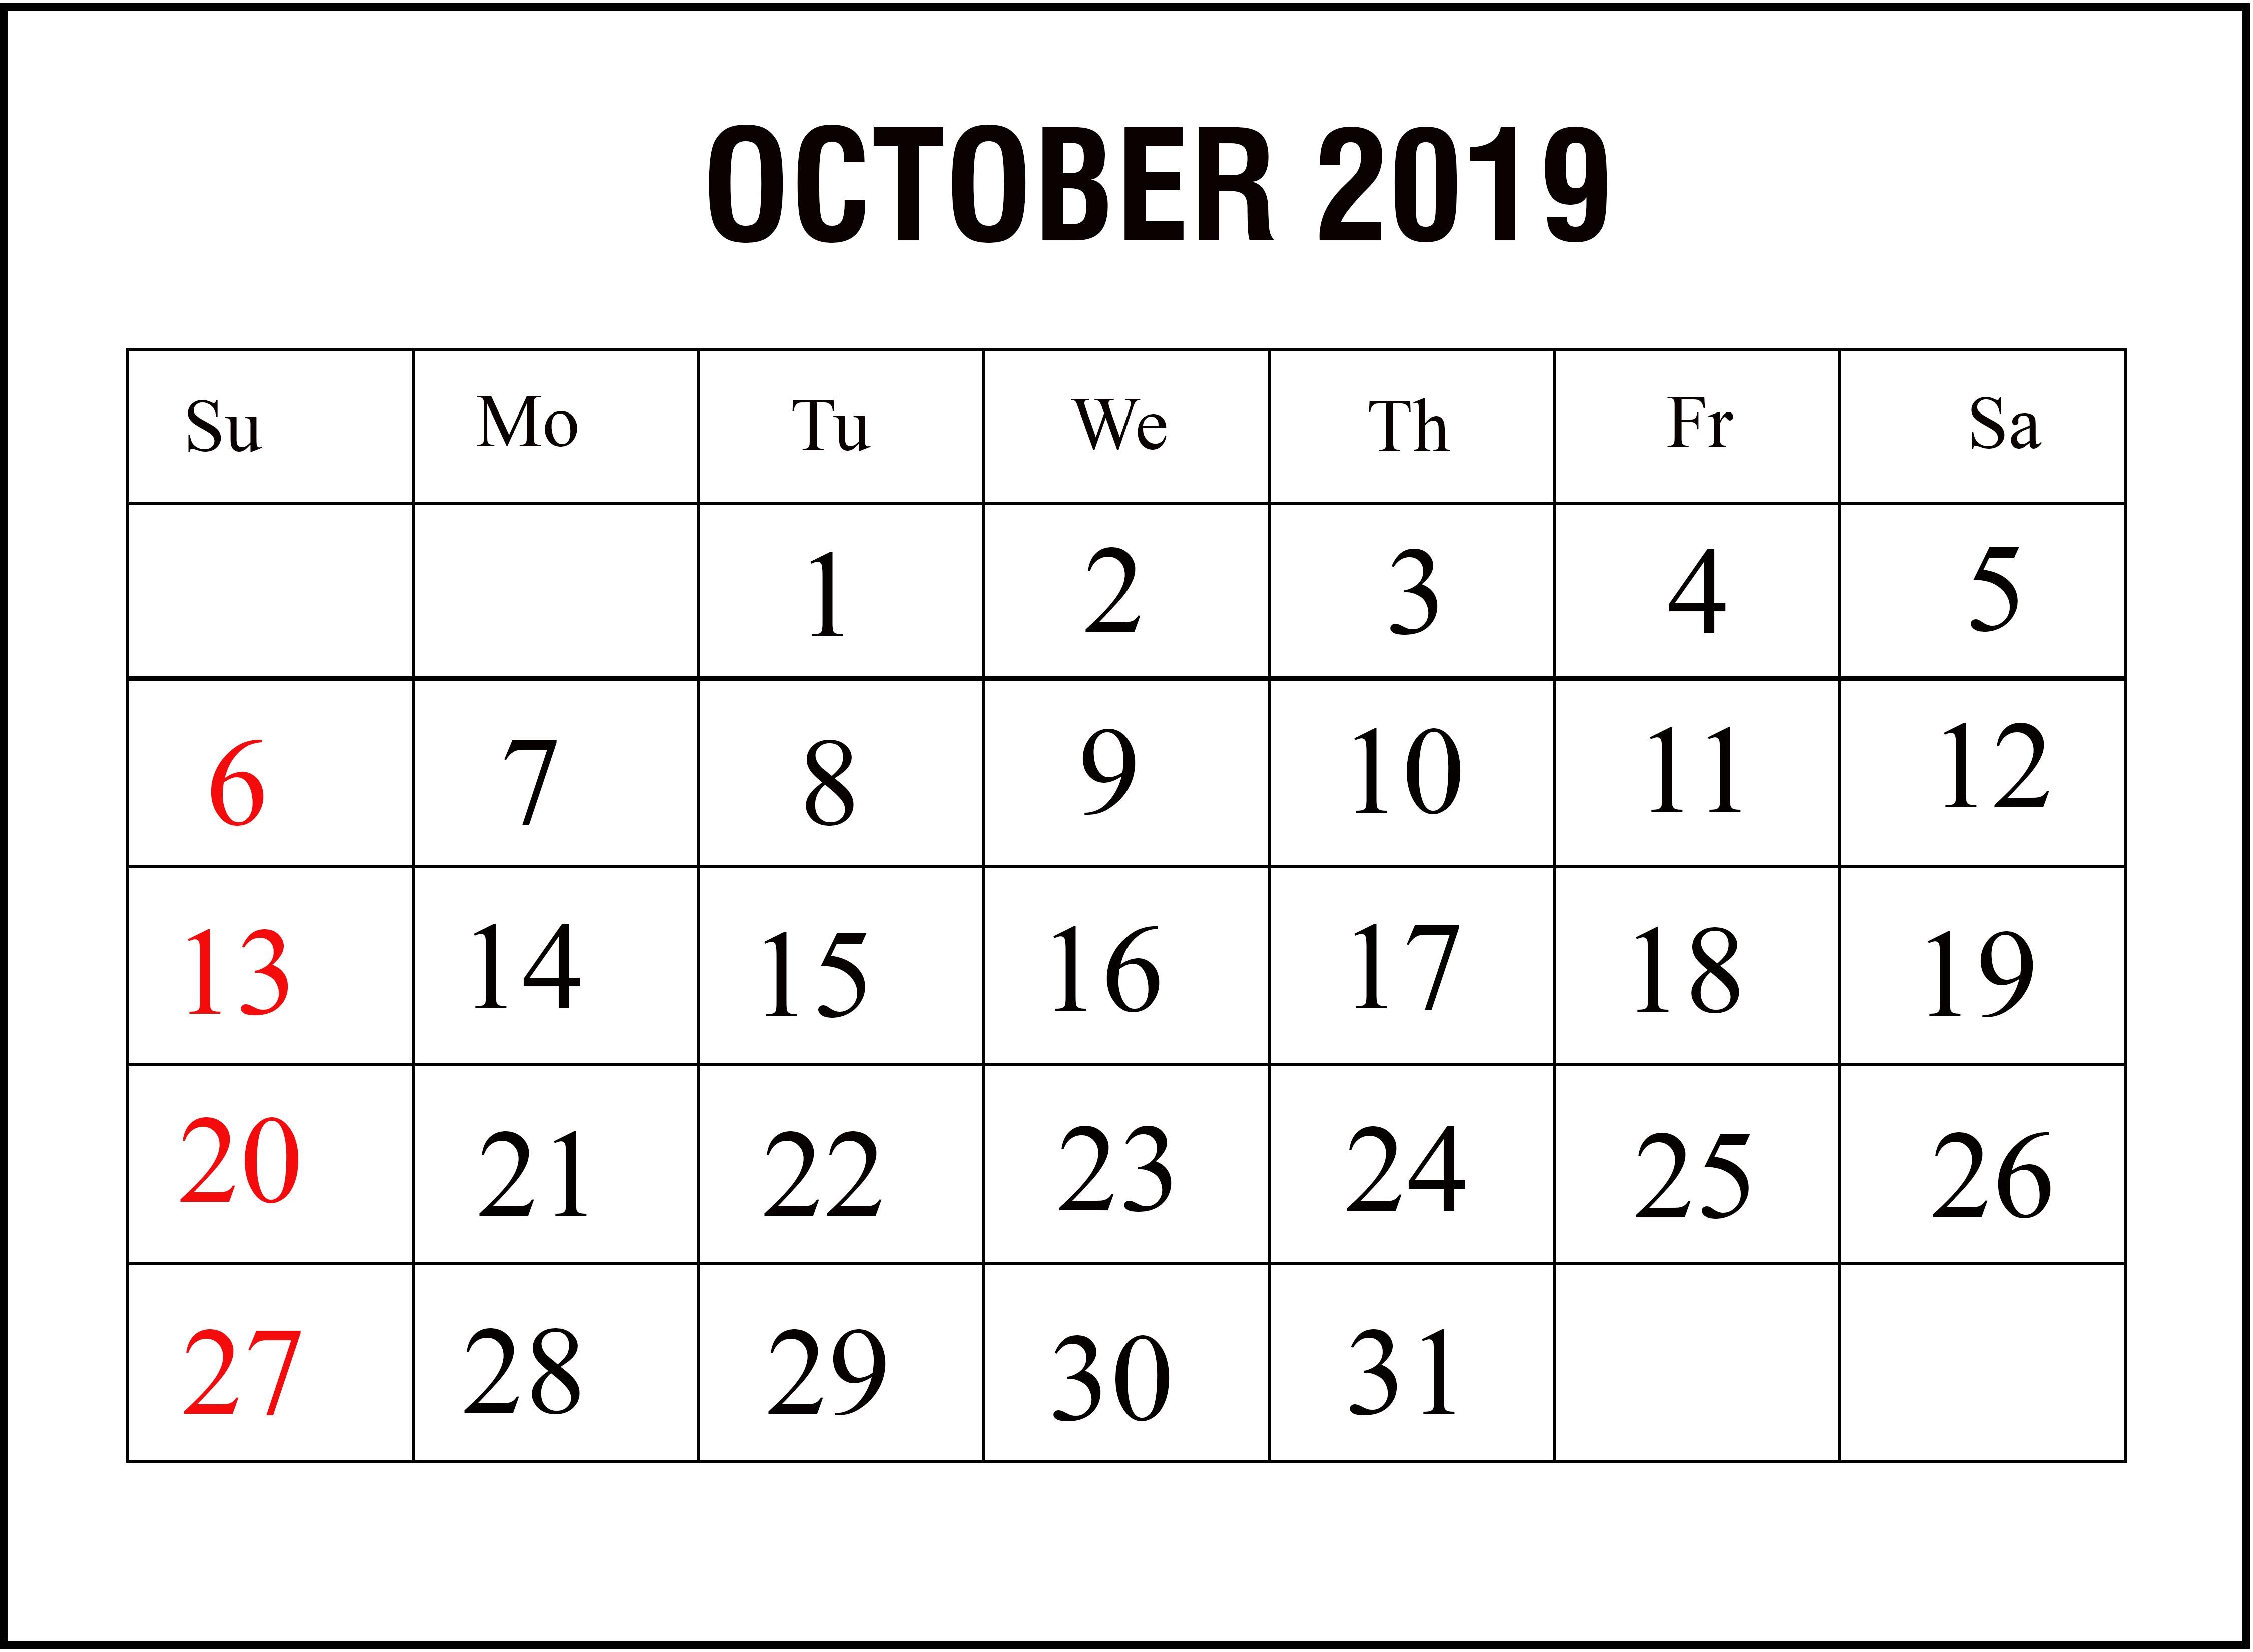 Blank Calendar October 2019 Printable A4 Page November November2019 November2019calendar Calendar Template Calendar Printables Printable Calendar Template